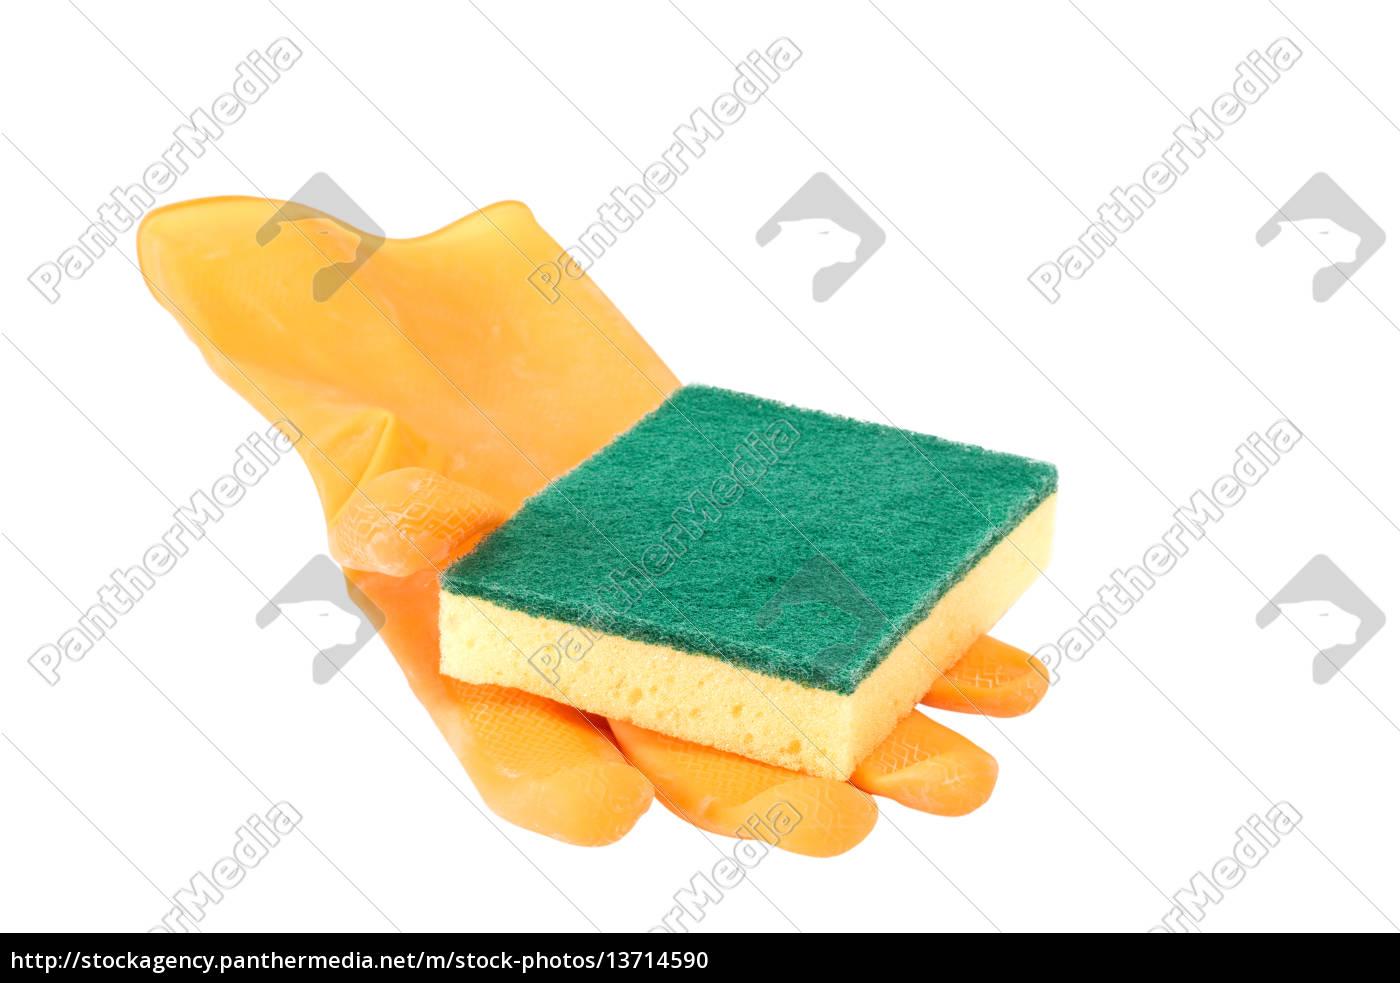 scrubbing, sponge, on, rubber, glove - 13714590